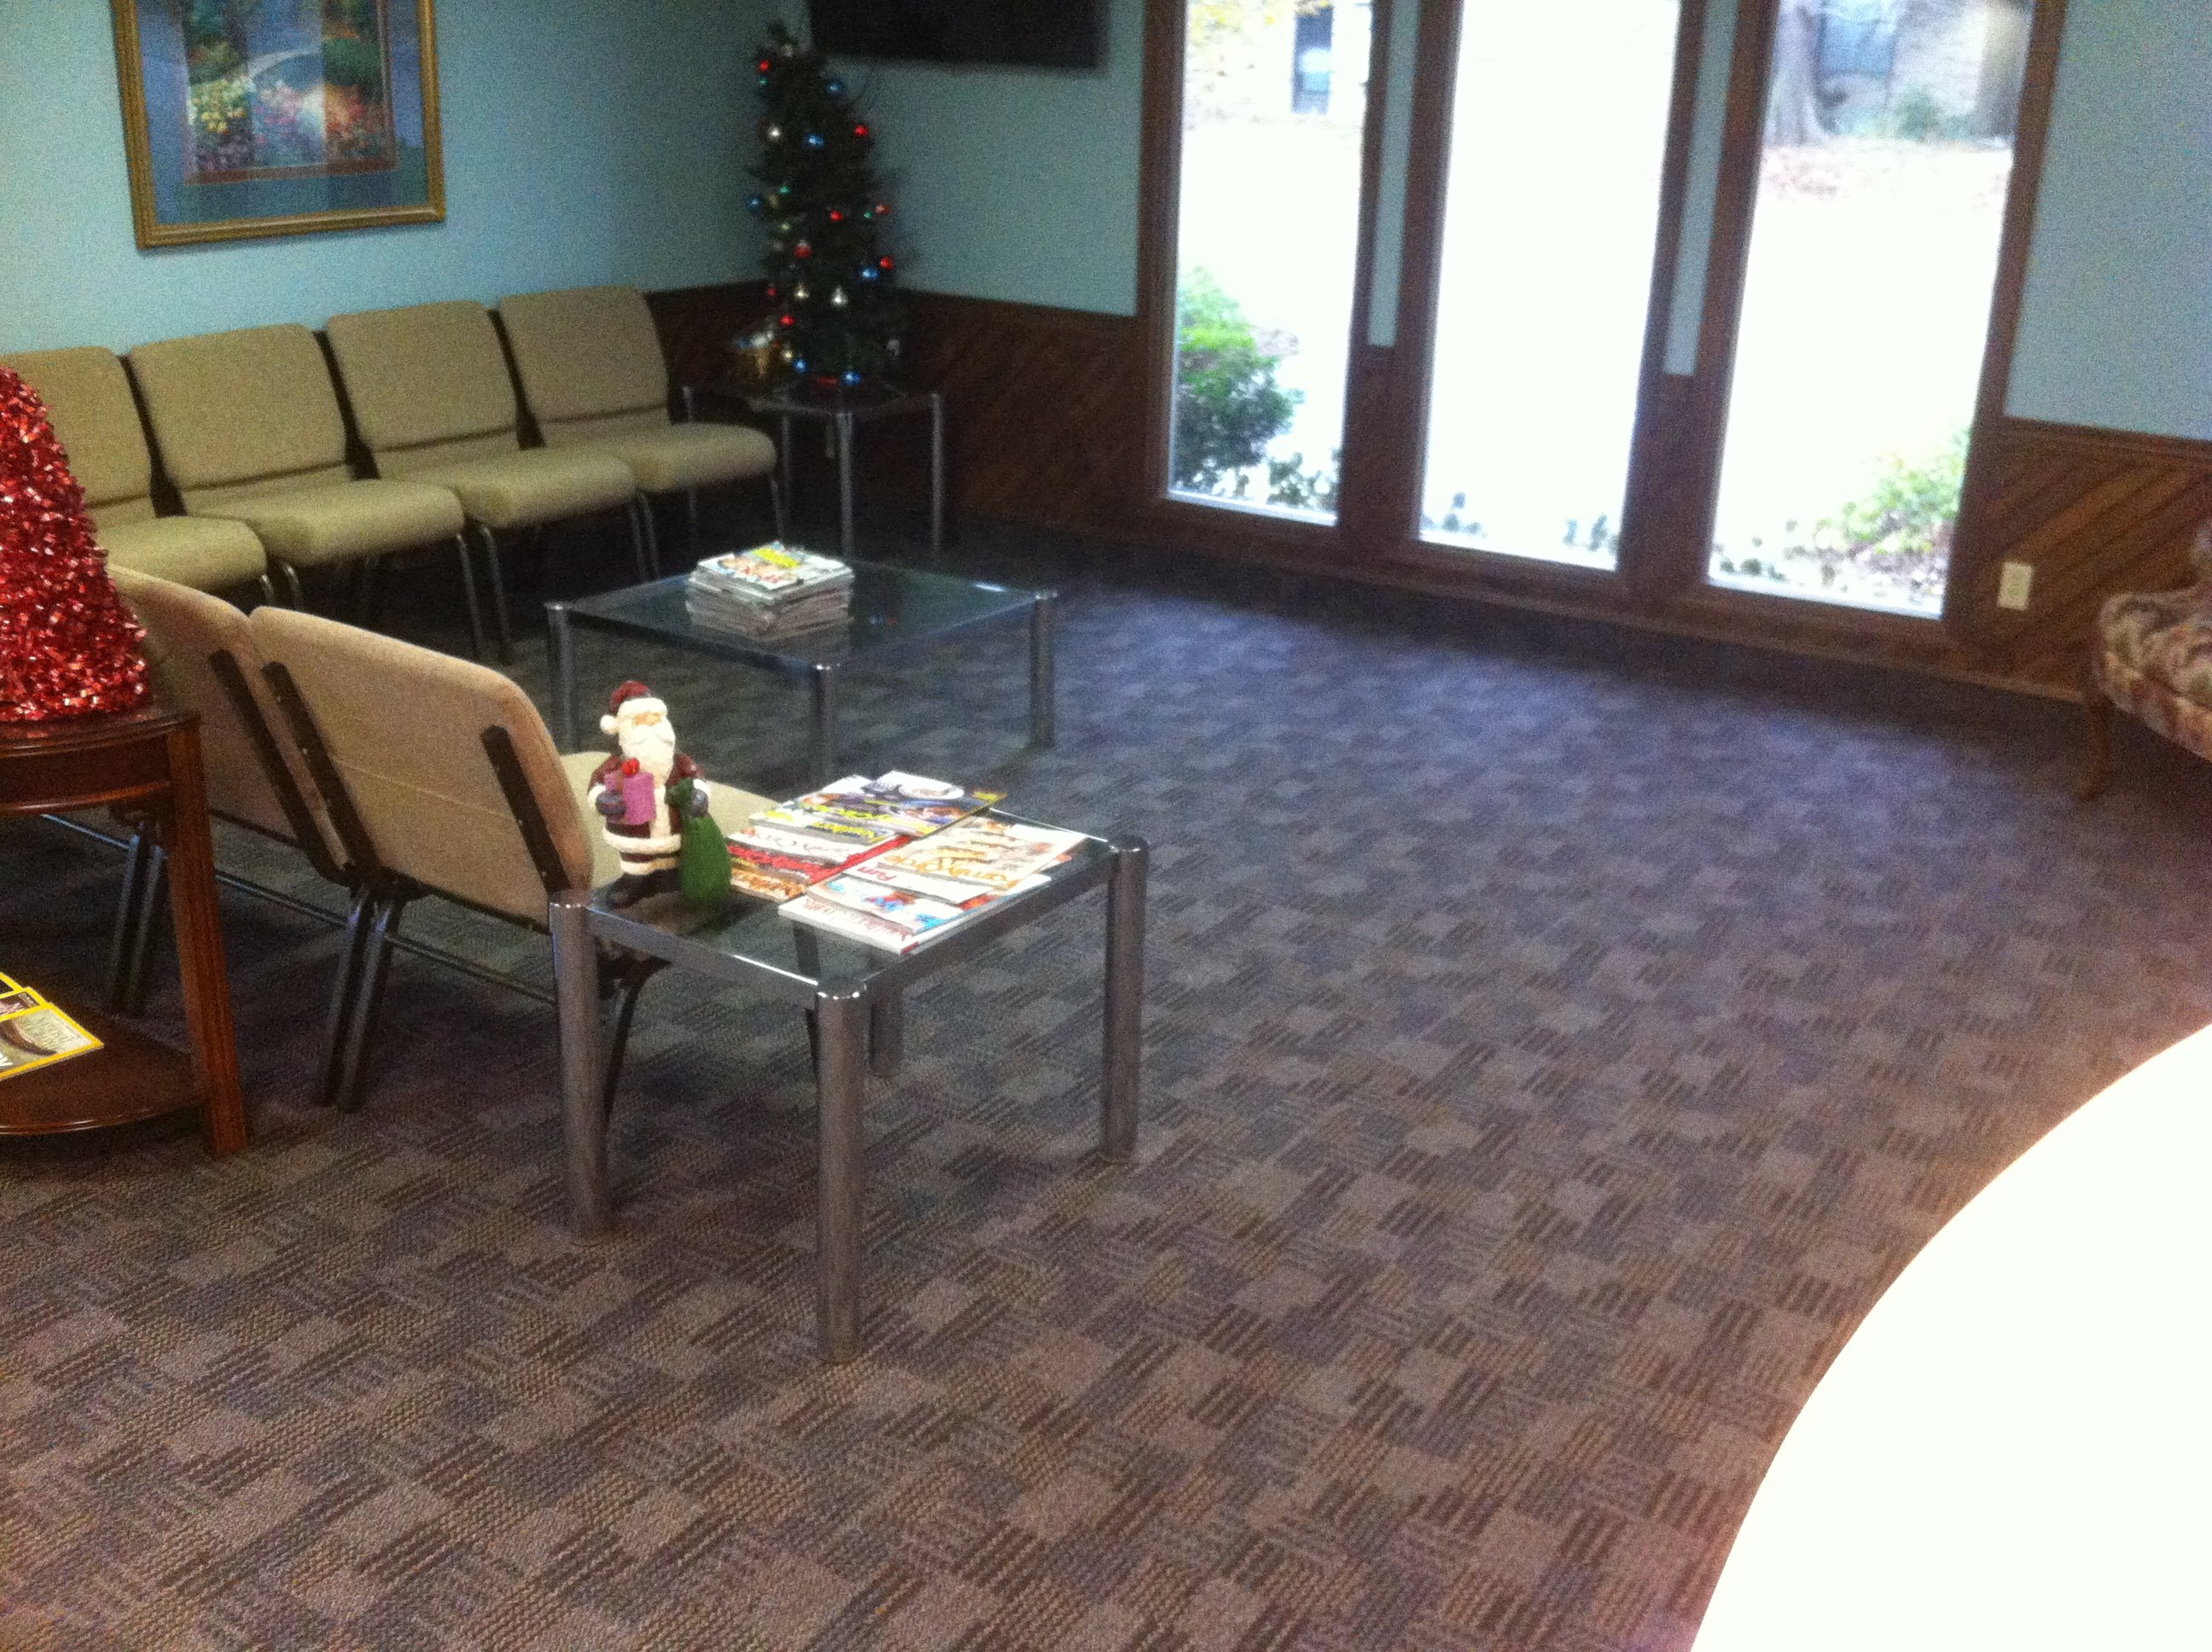 Inside view of Progressive Dental clinic